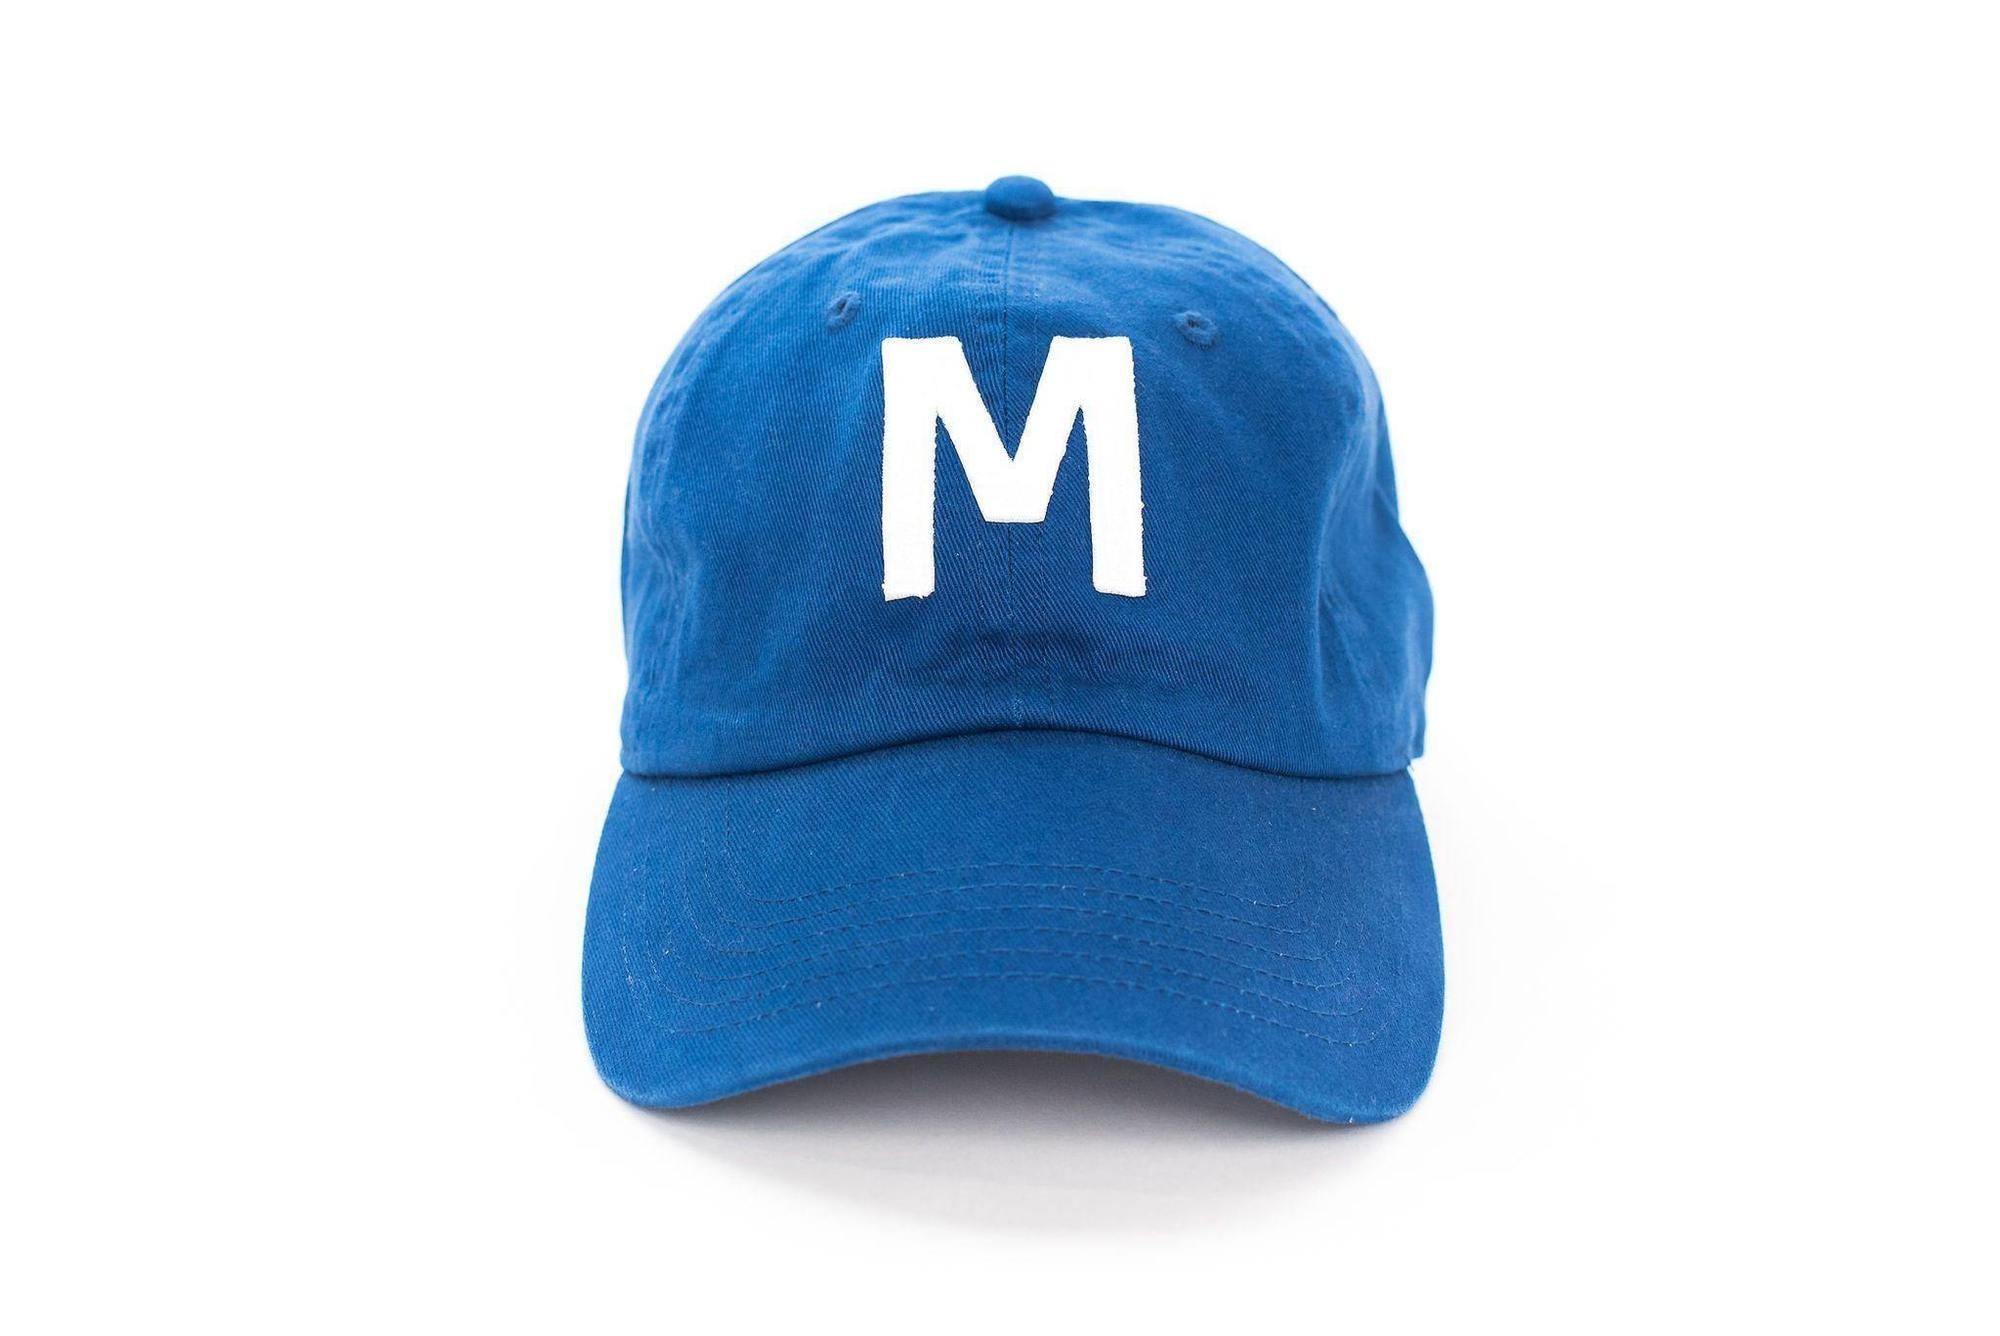 Royal Blue baseball hat